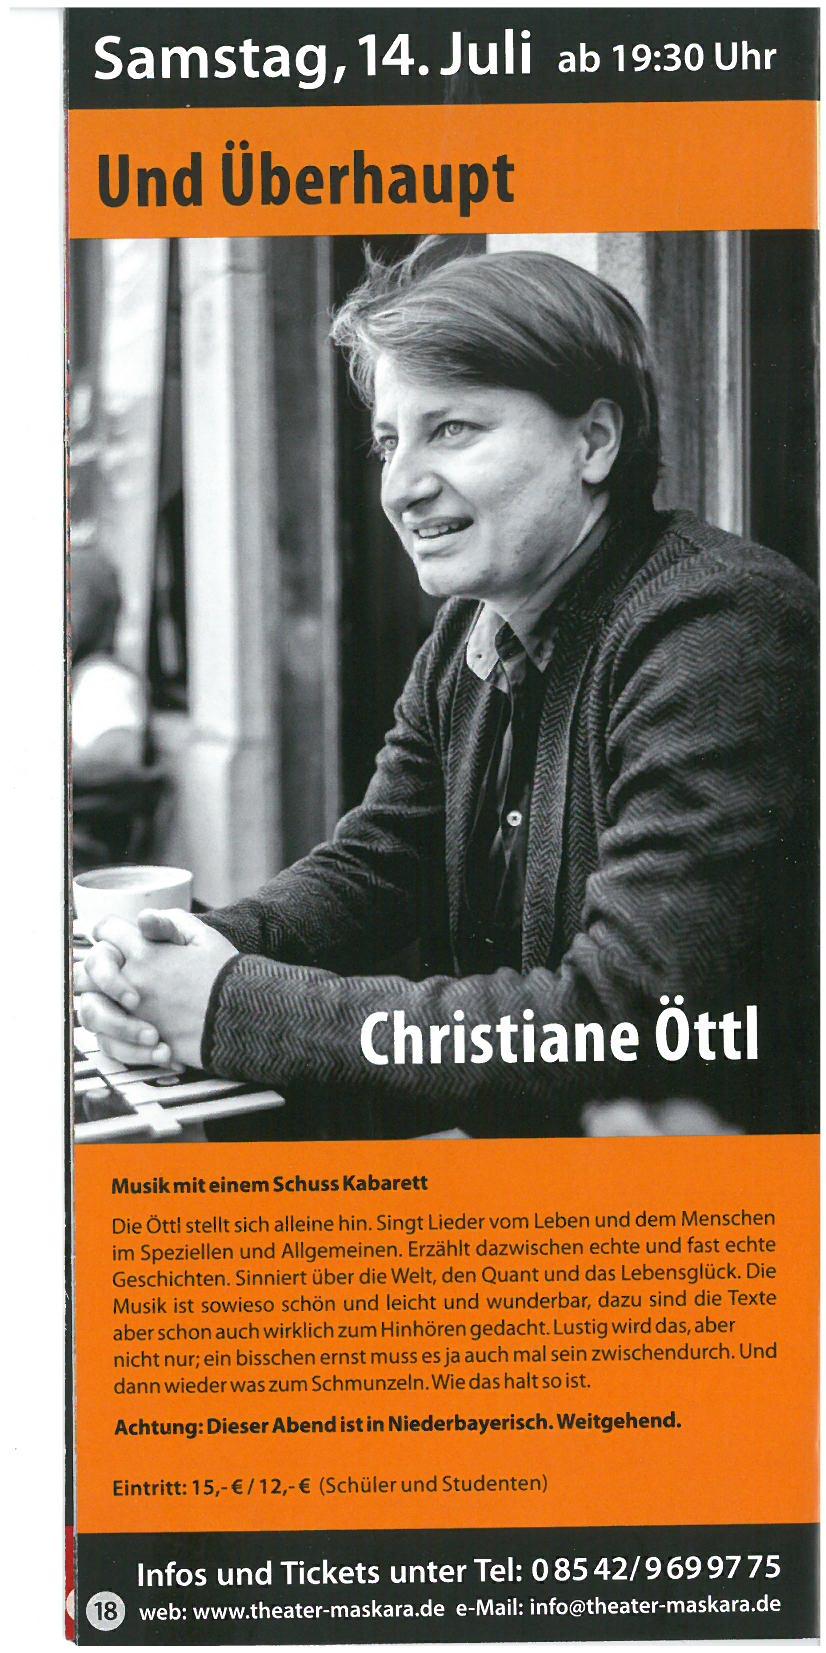 Christiane Öttl